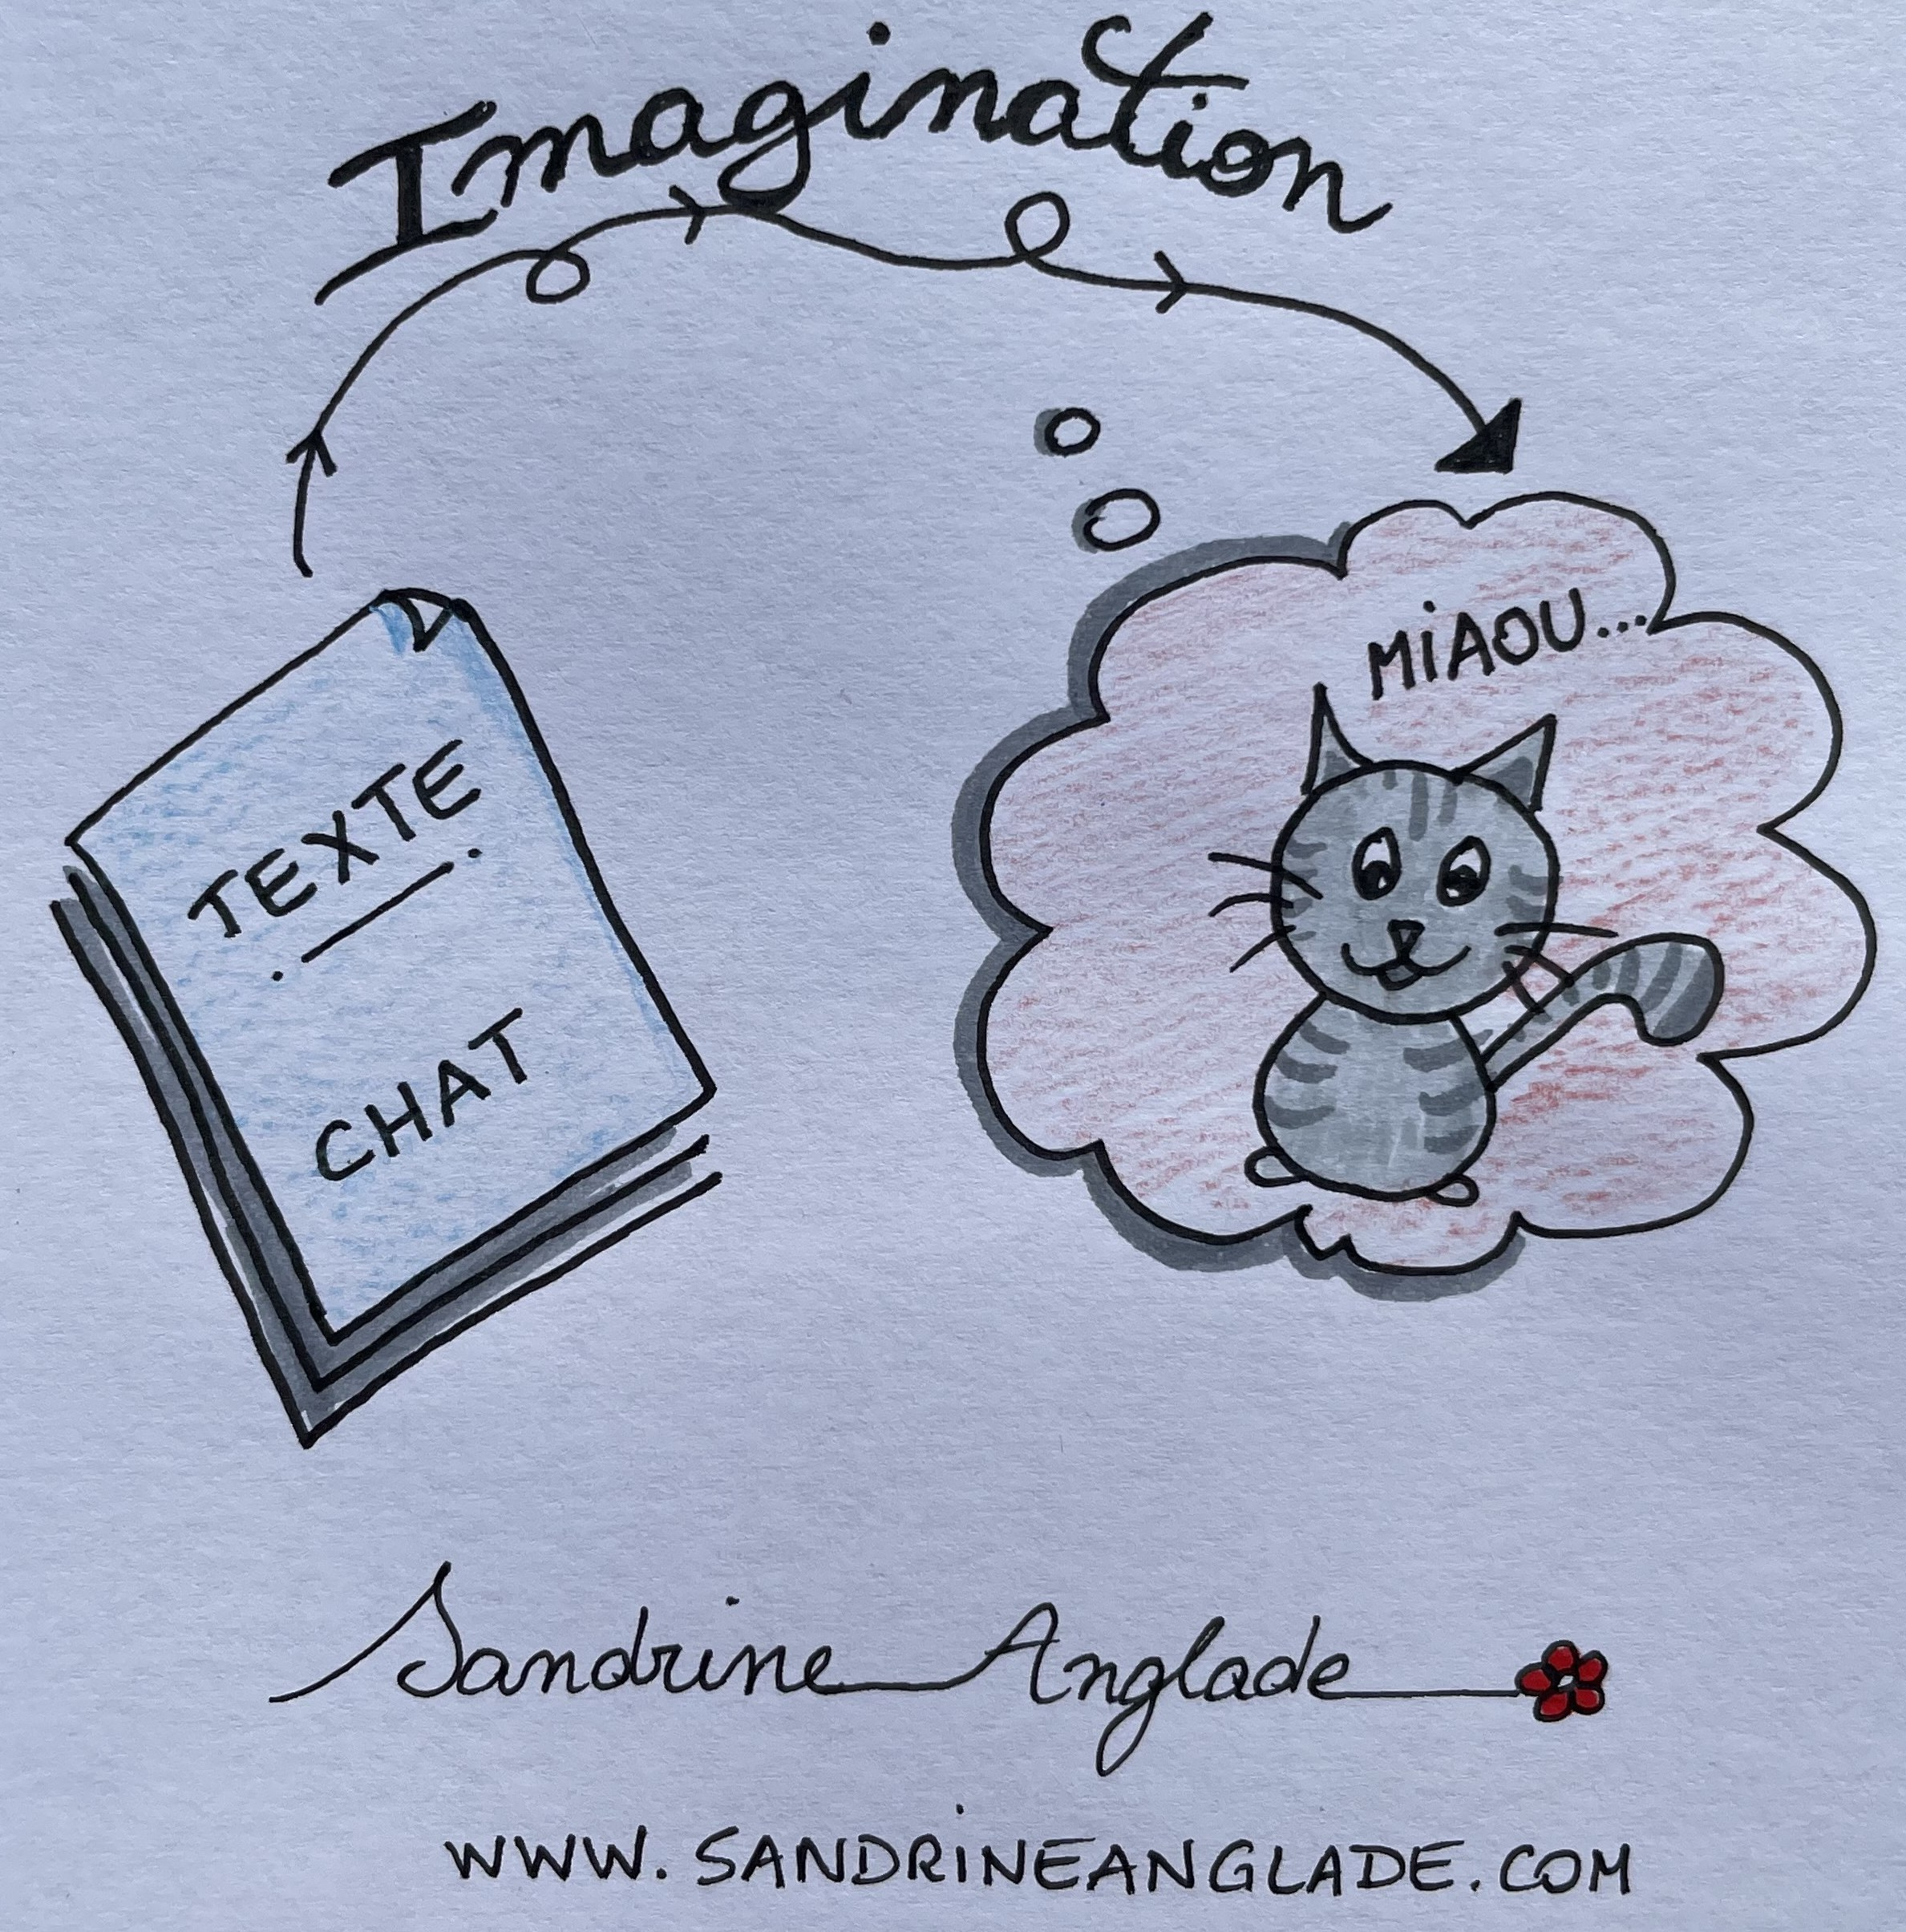 imagination claudia euebio sandrine anglade